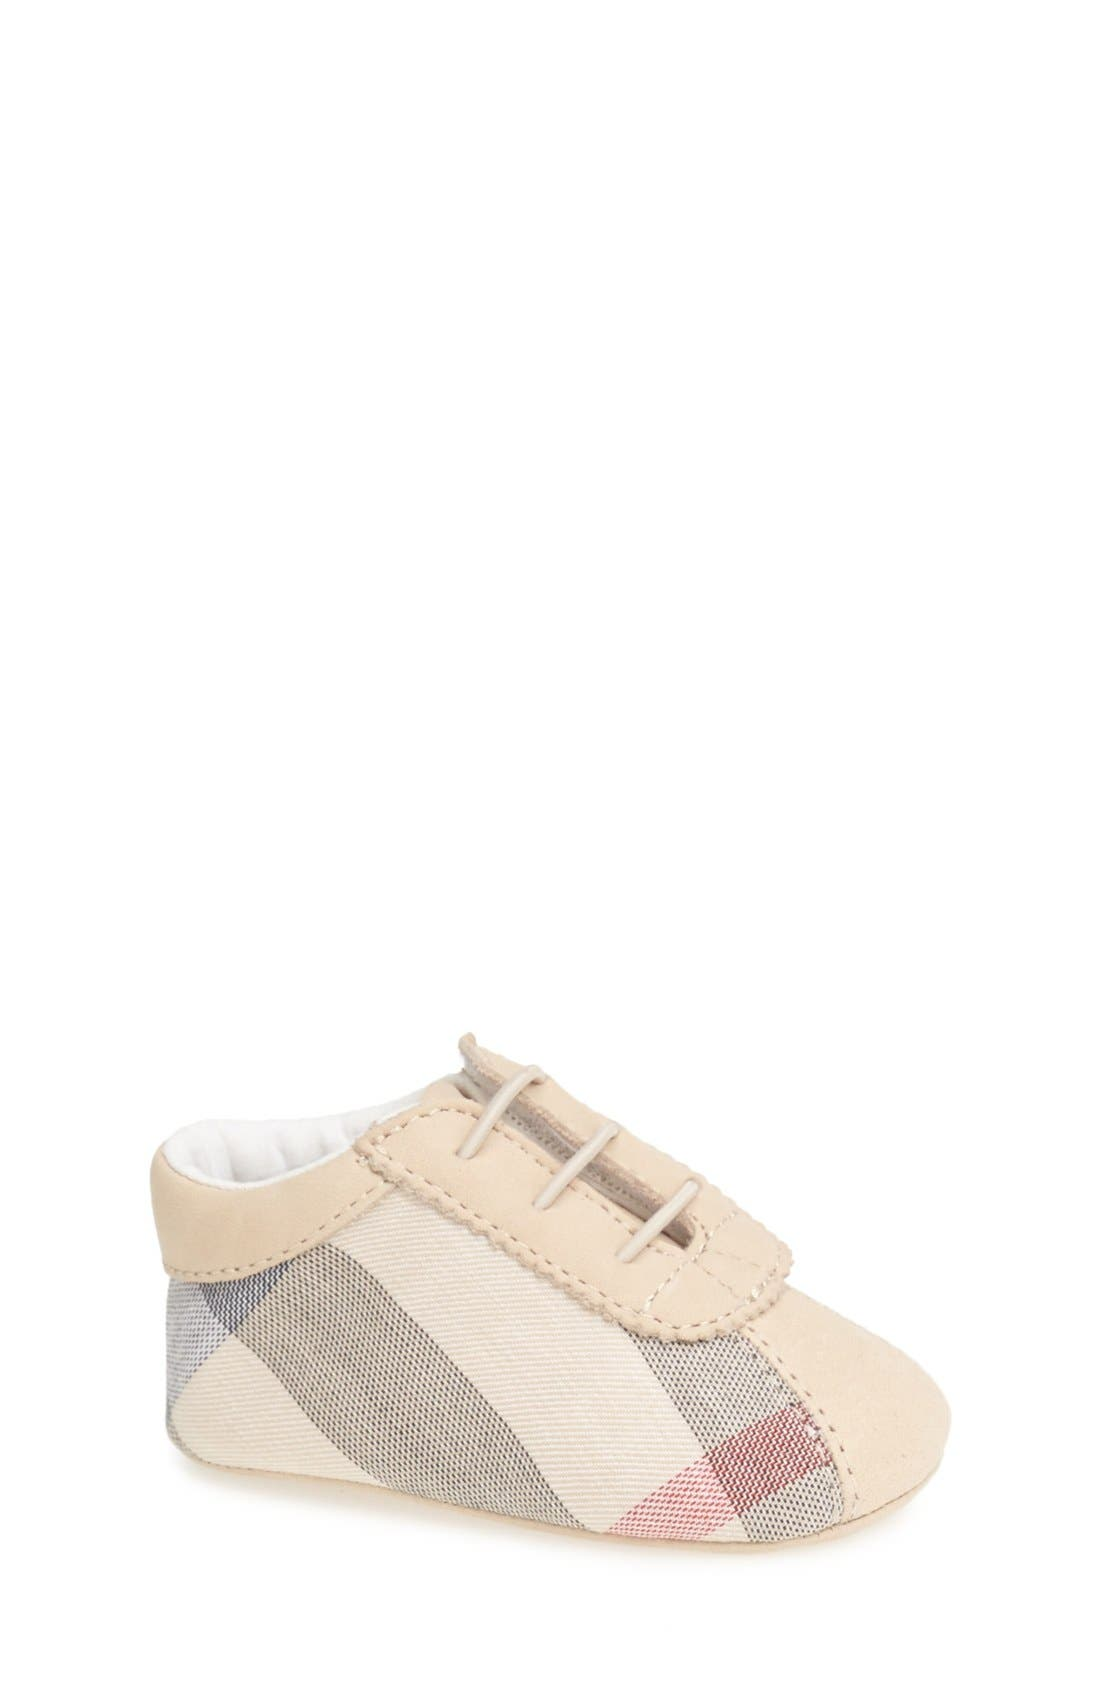 'Bosco' Crib Shoe,                         Main,                         color, 250